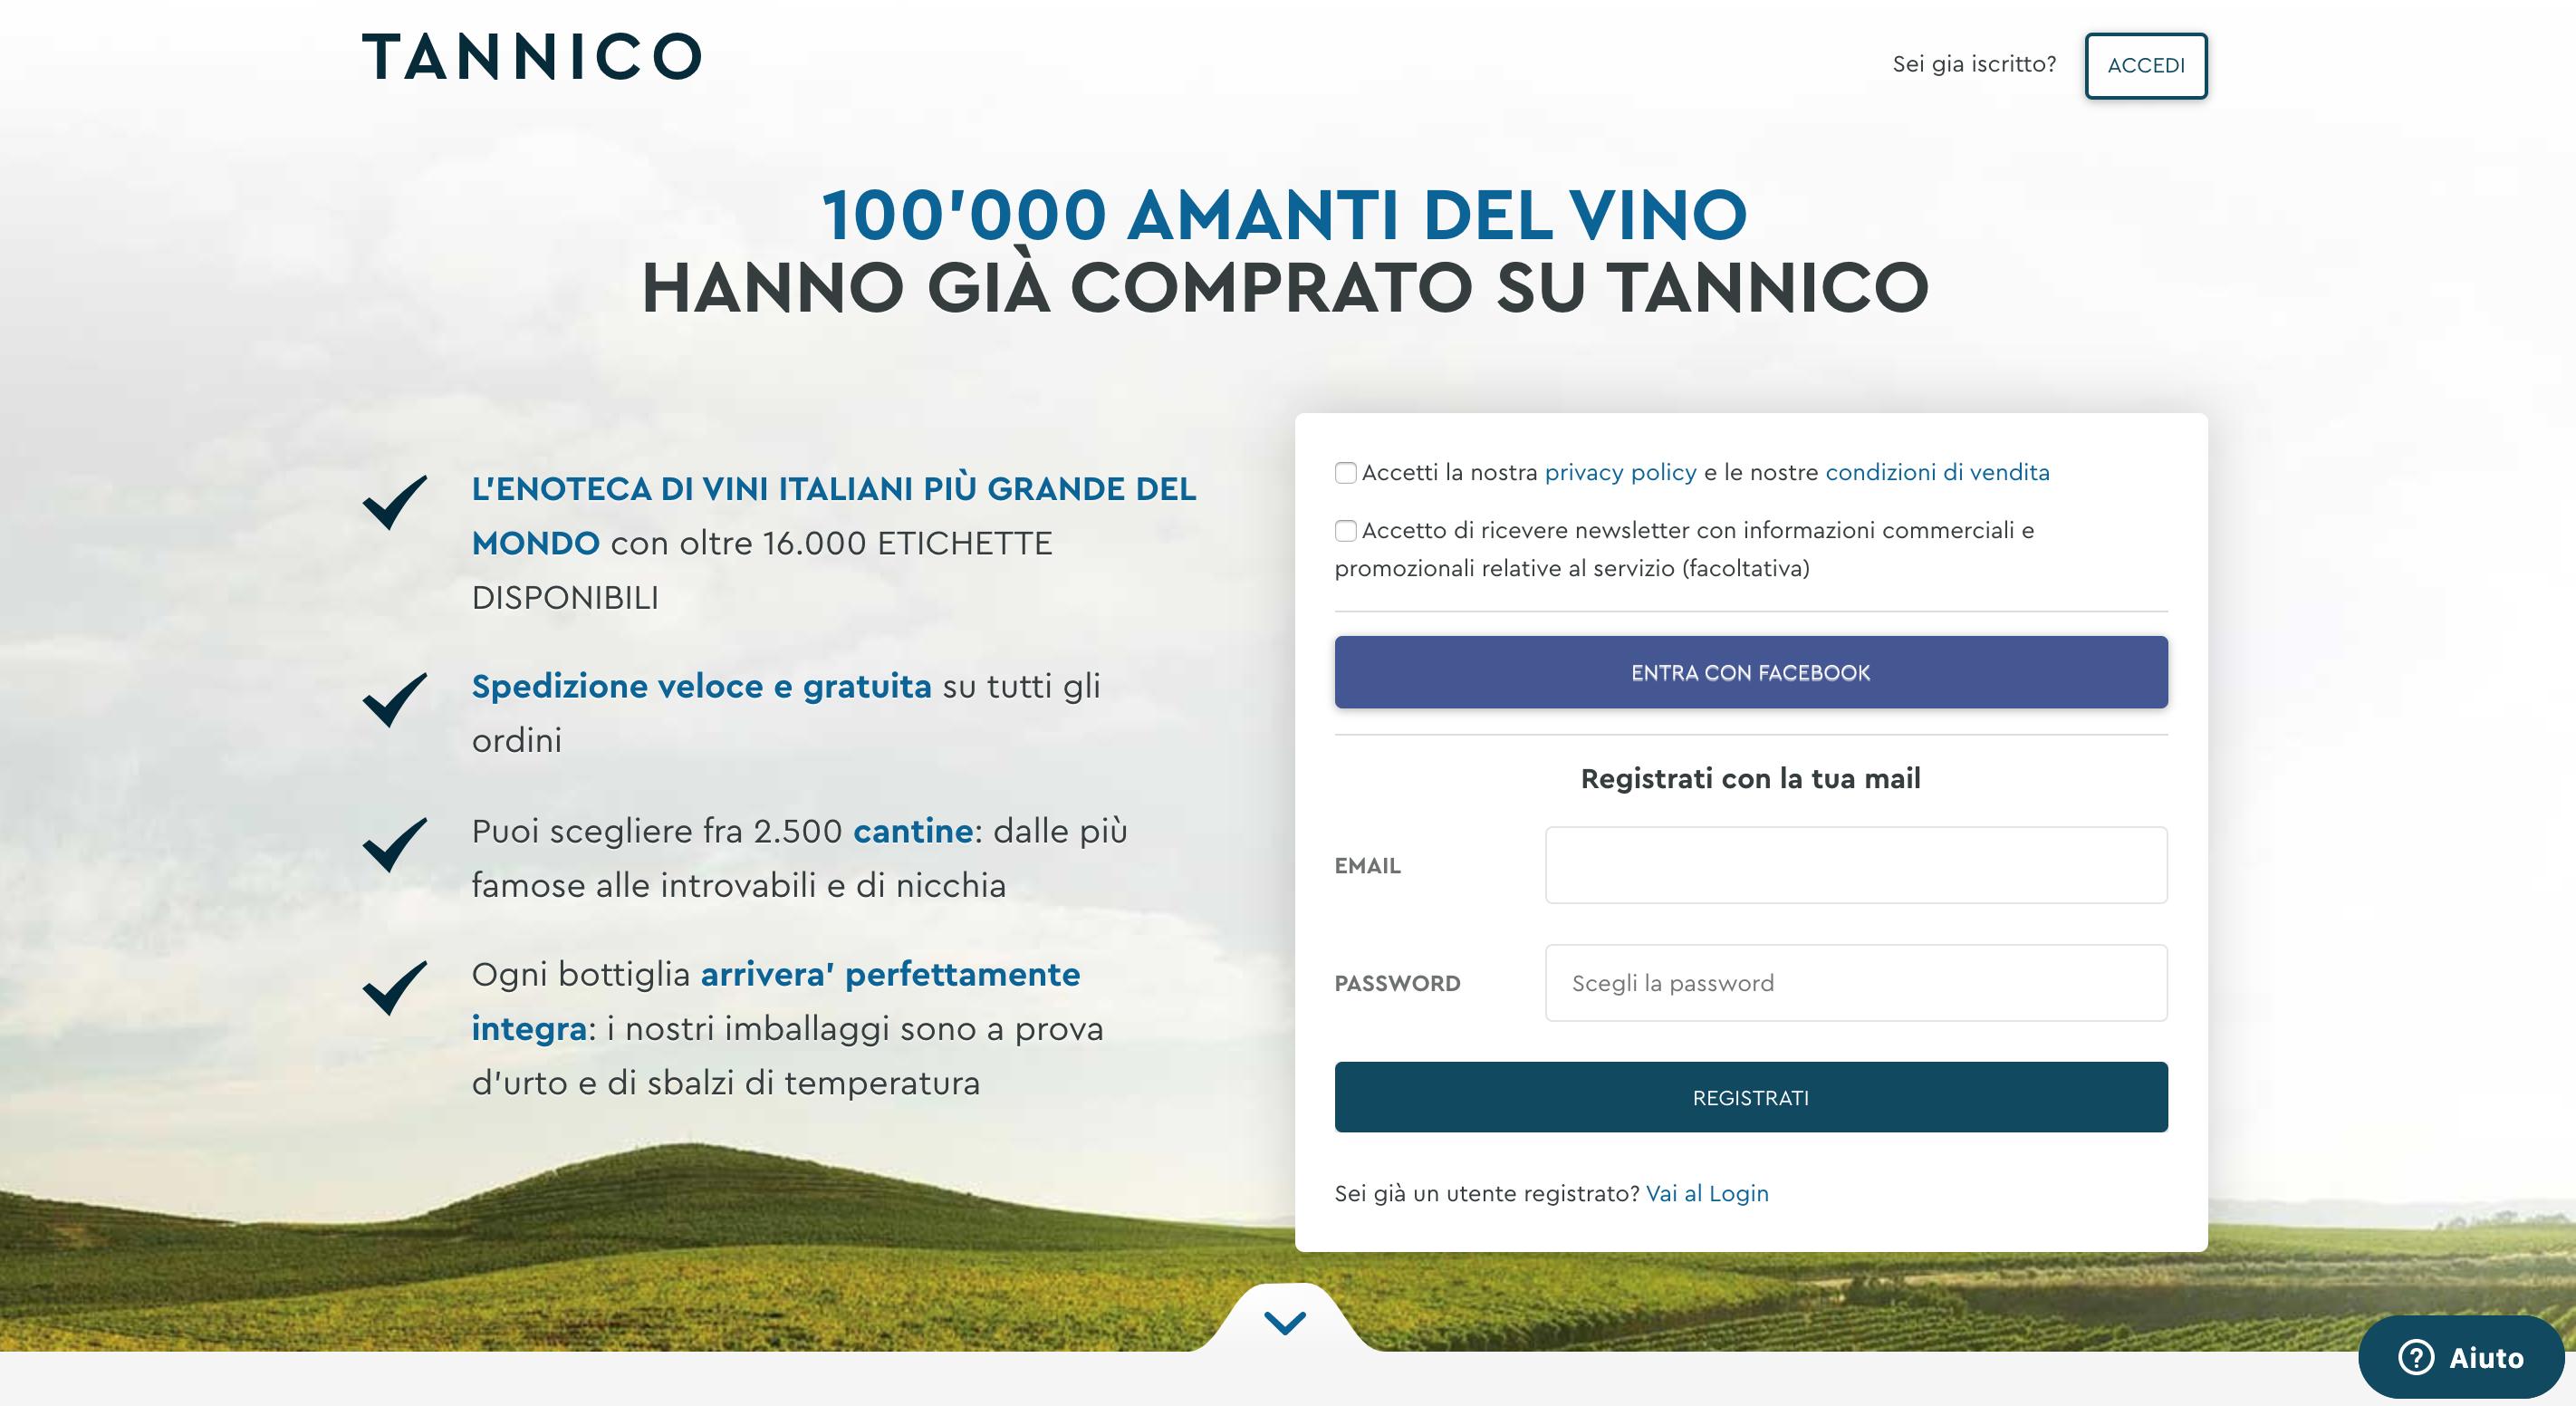 Tannico Vino online